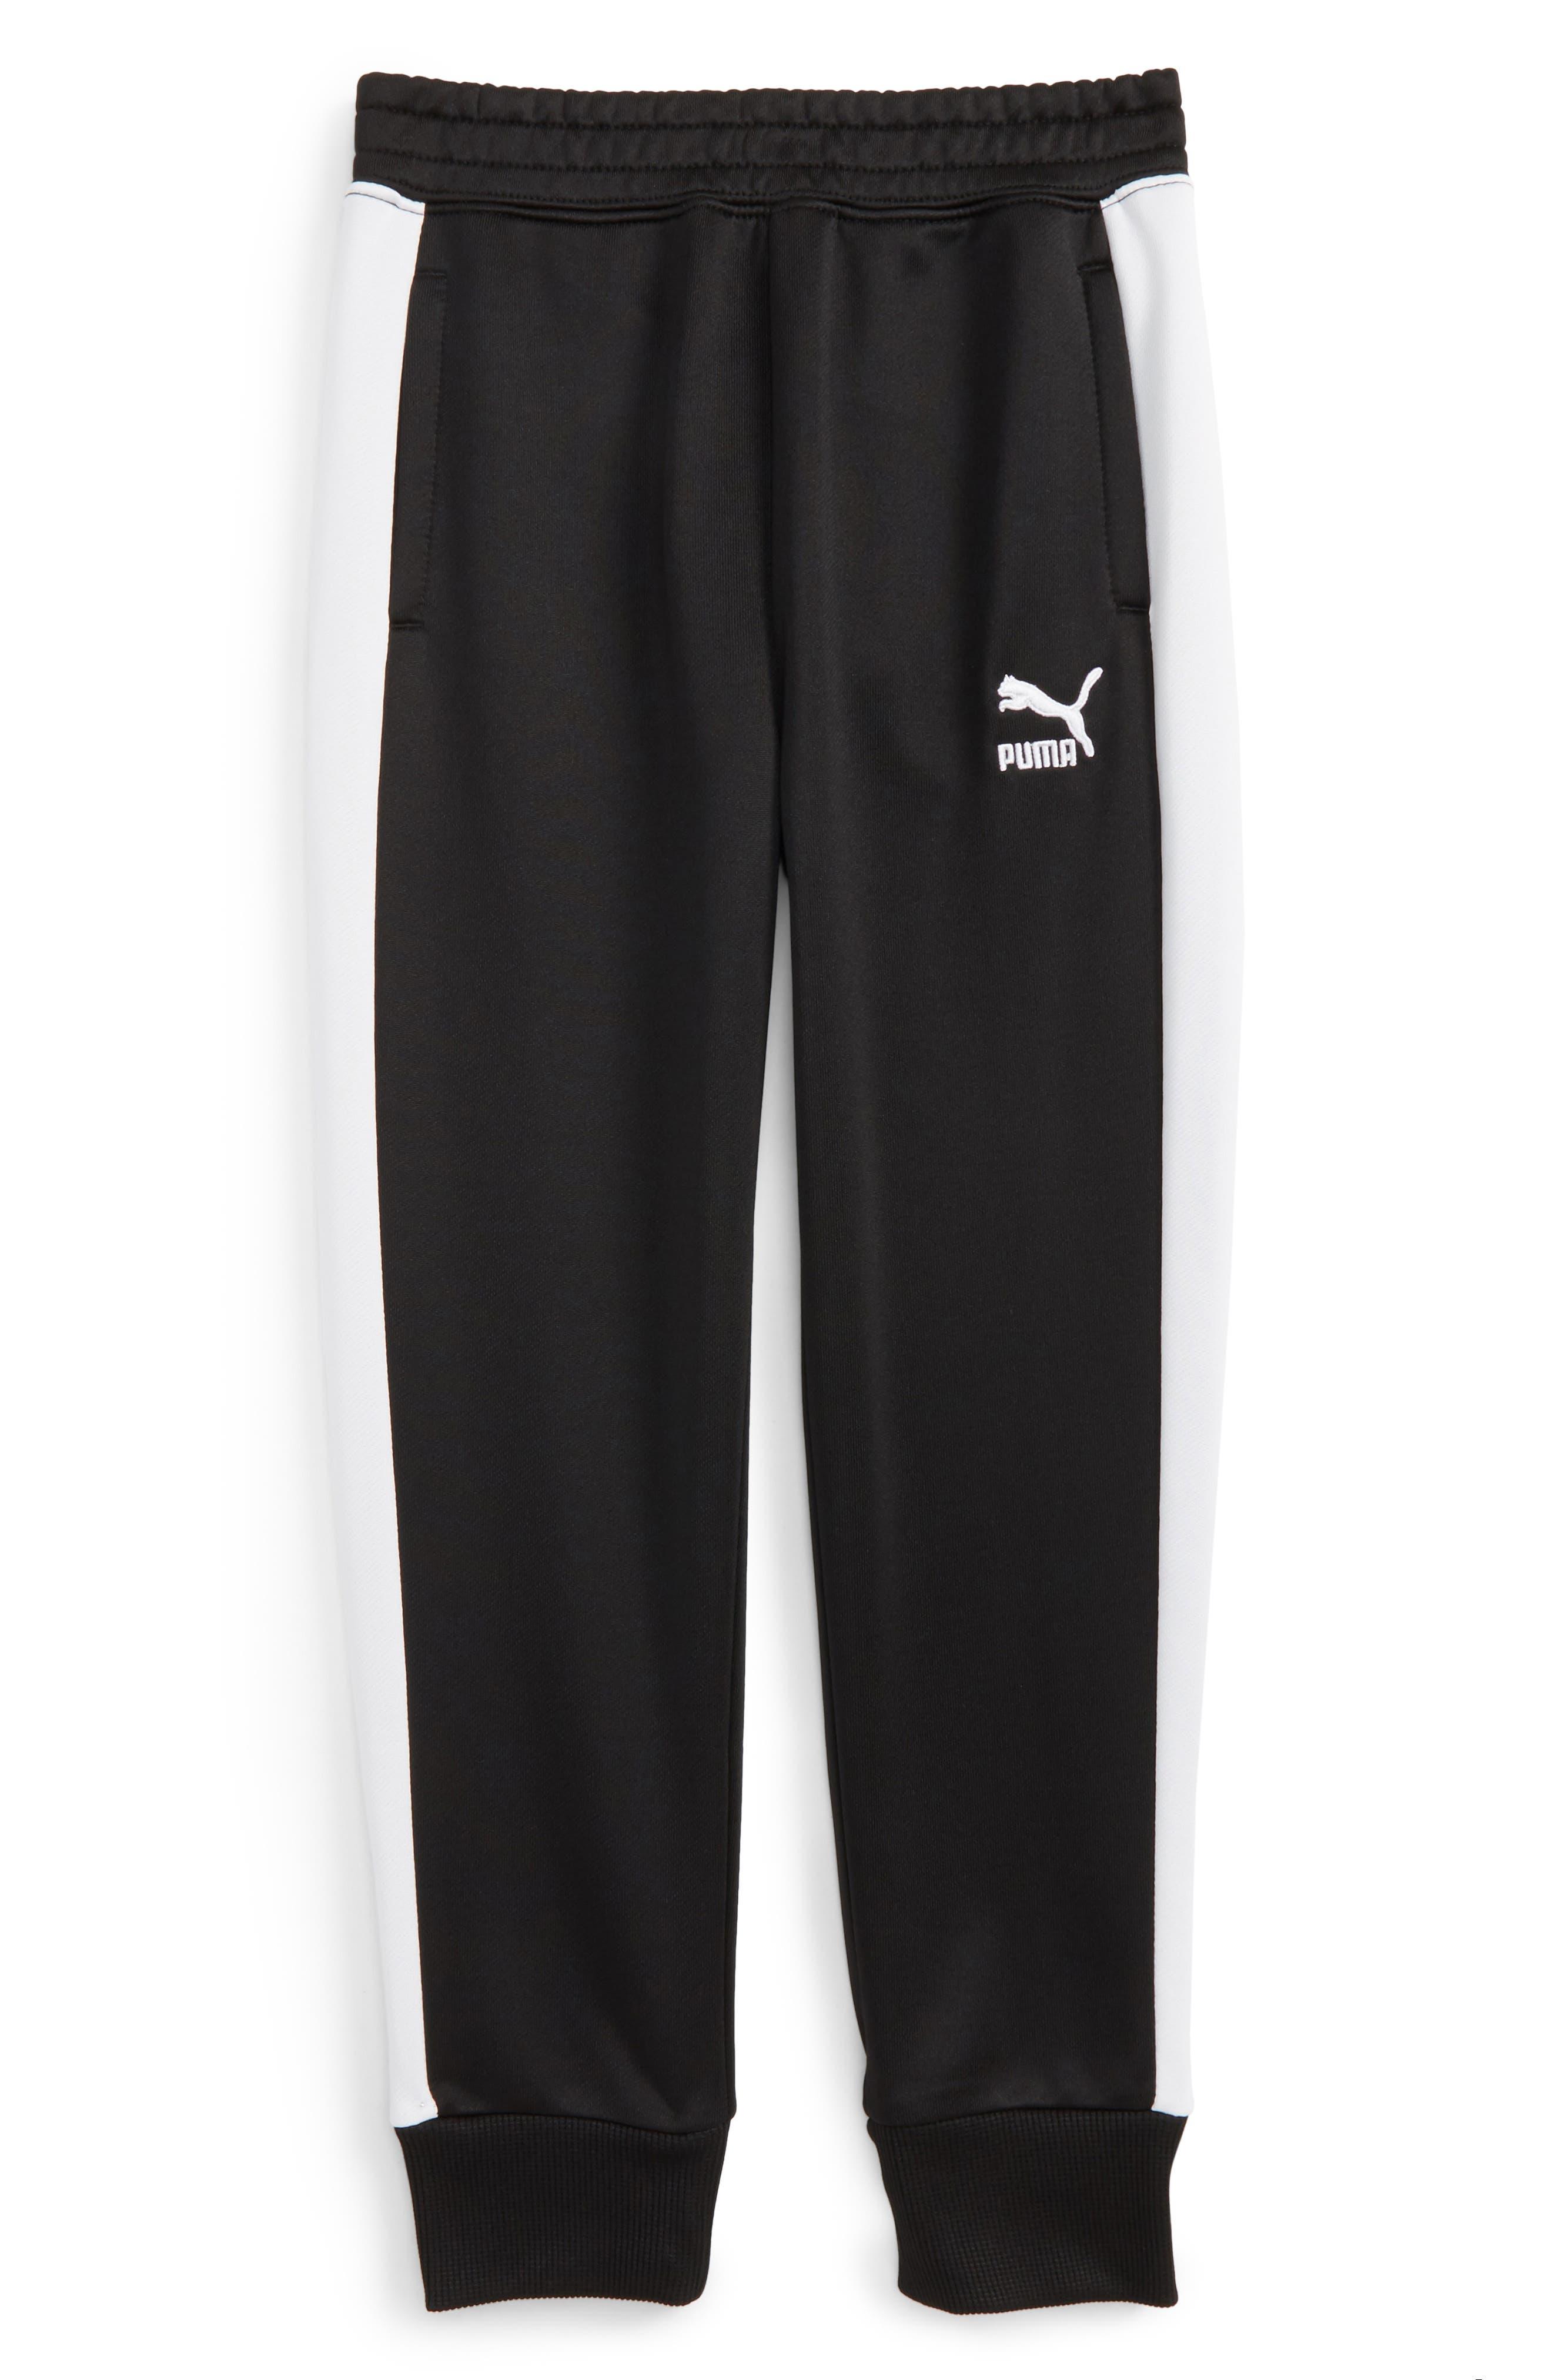 PUMA T7 Jogger Pants (Little Boys & Big Boys)